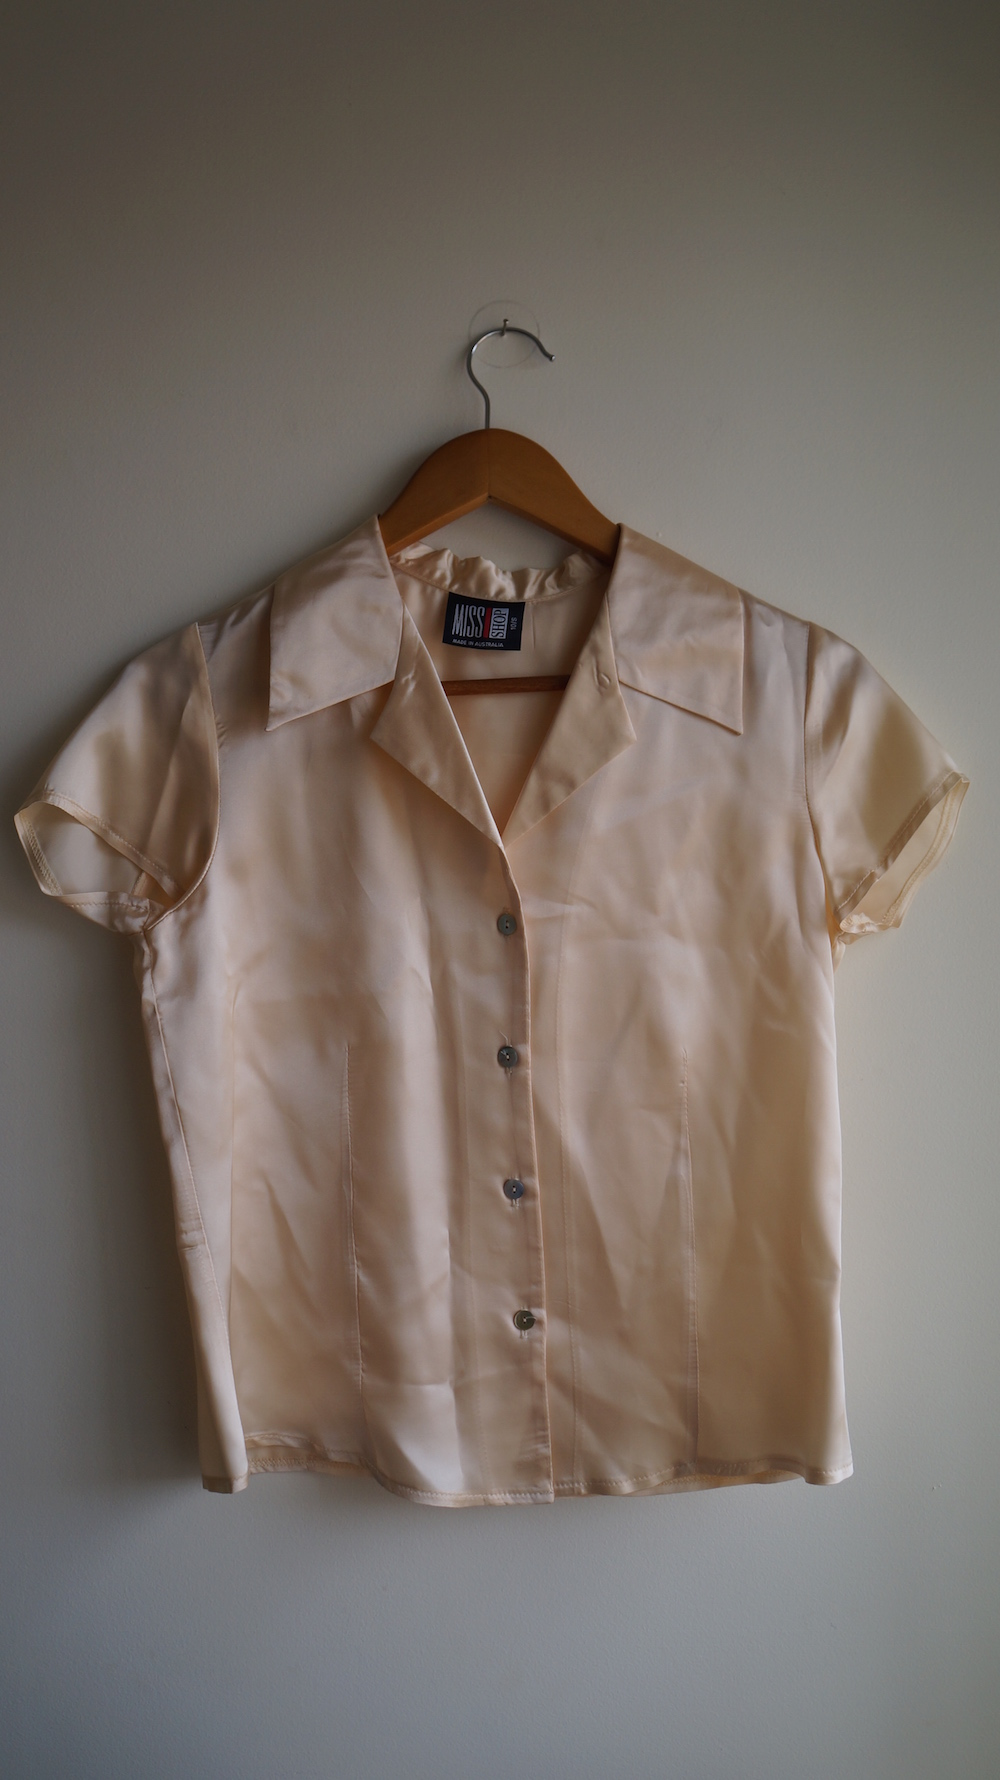 84e577d01 Miss Shop Silk Peach Cream Ivory Short Sleeve Collared Button ...